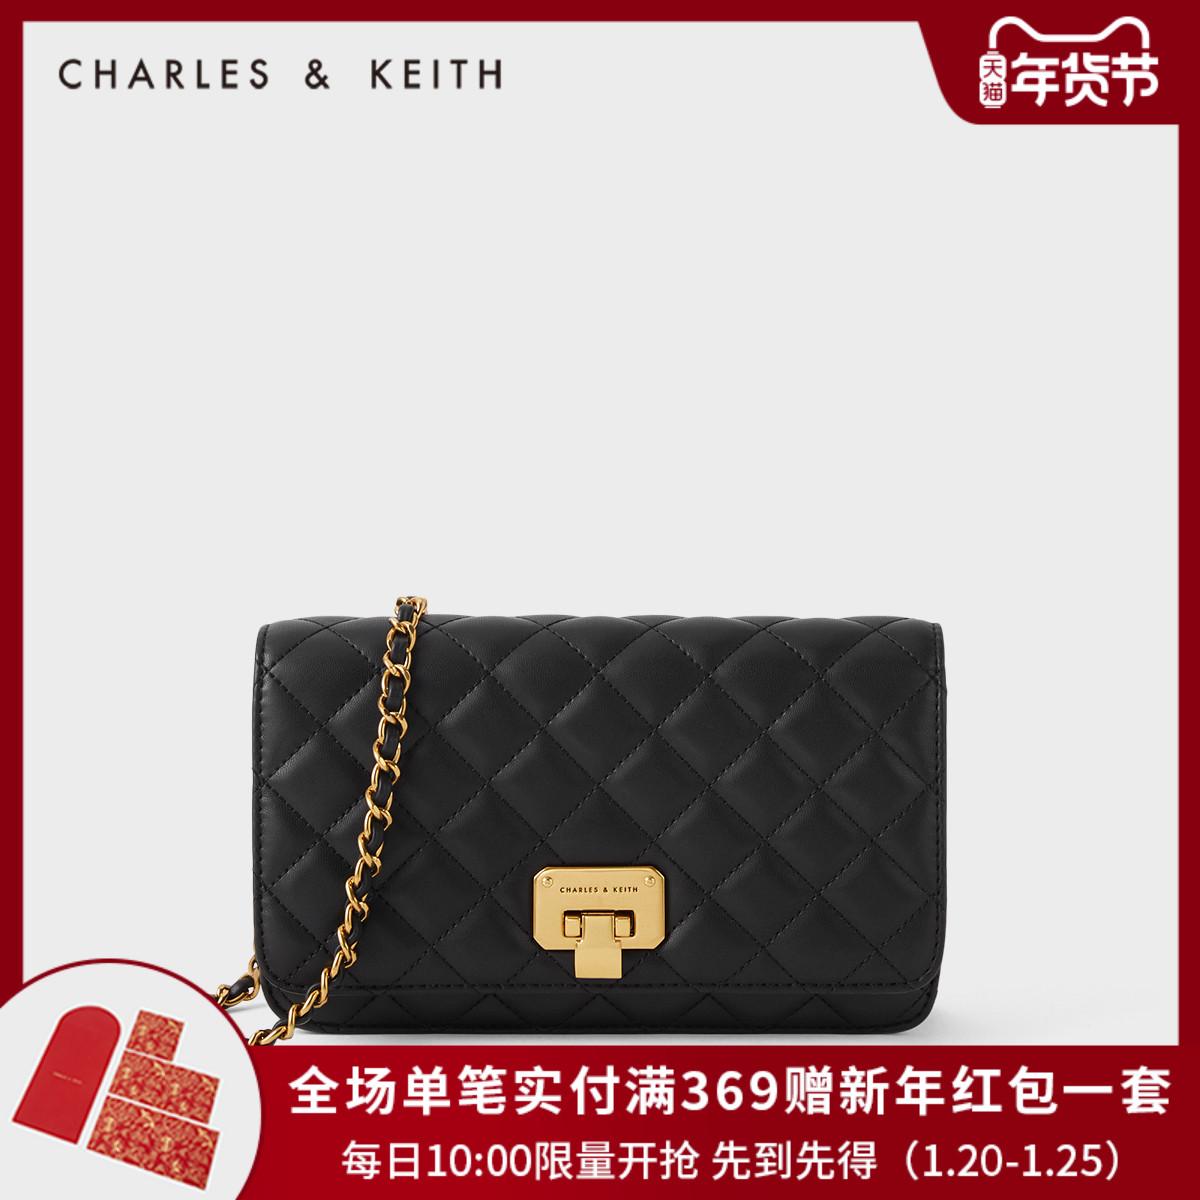 CHARLES&KEITH小香风CK2-70160082-2菱格链条斜挎包